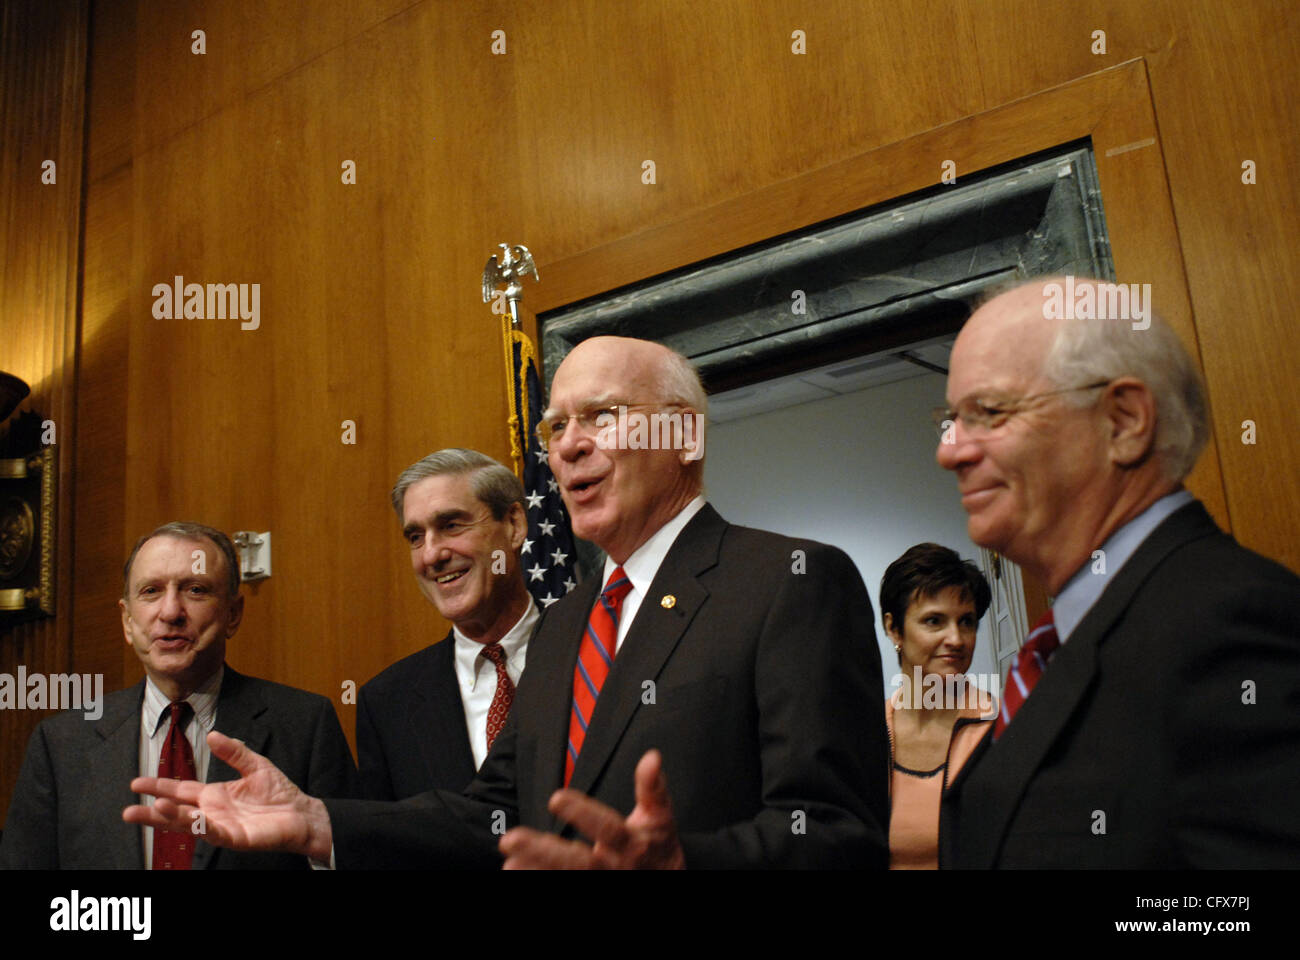 Mar 27, 2007 - Washington, DC, USA - FBI director ROBERT MUELLER (second from left) stands with Senators ARLEN SPECTER Stock Photo